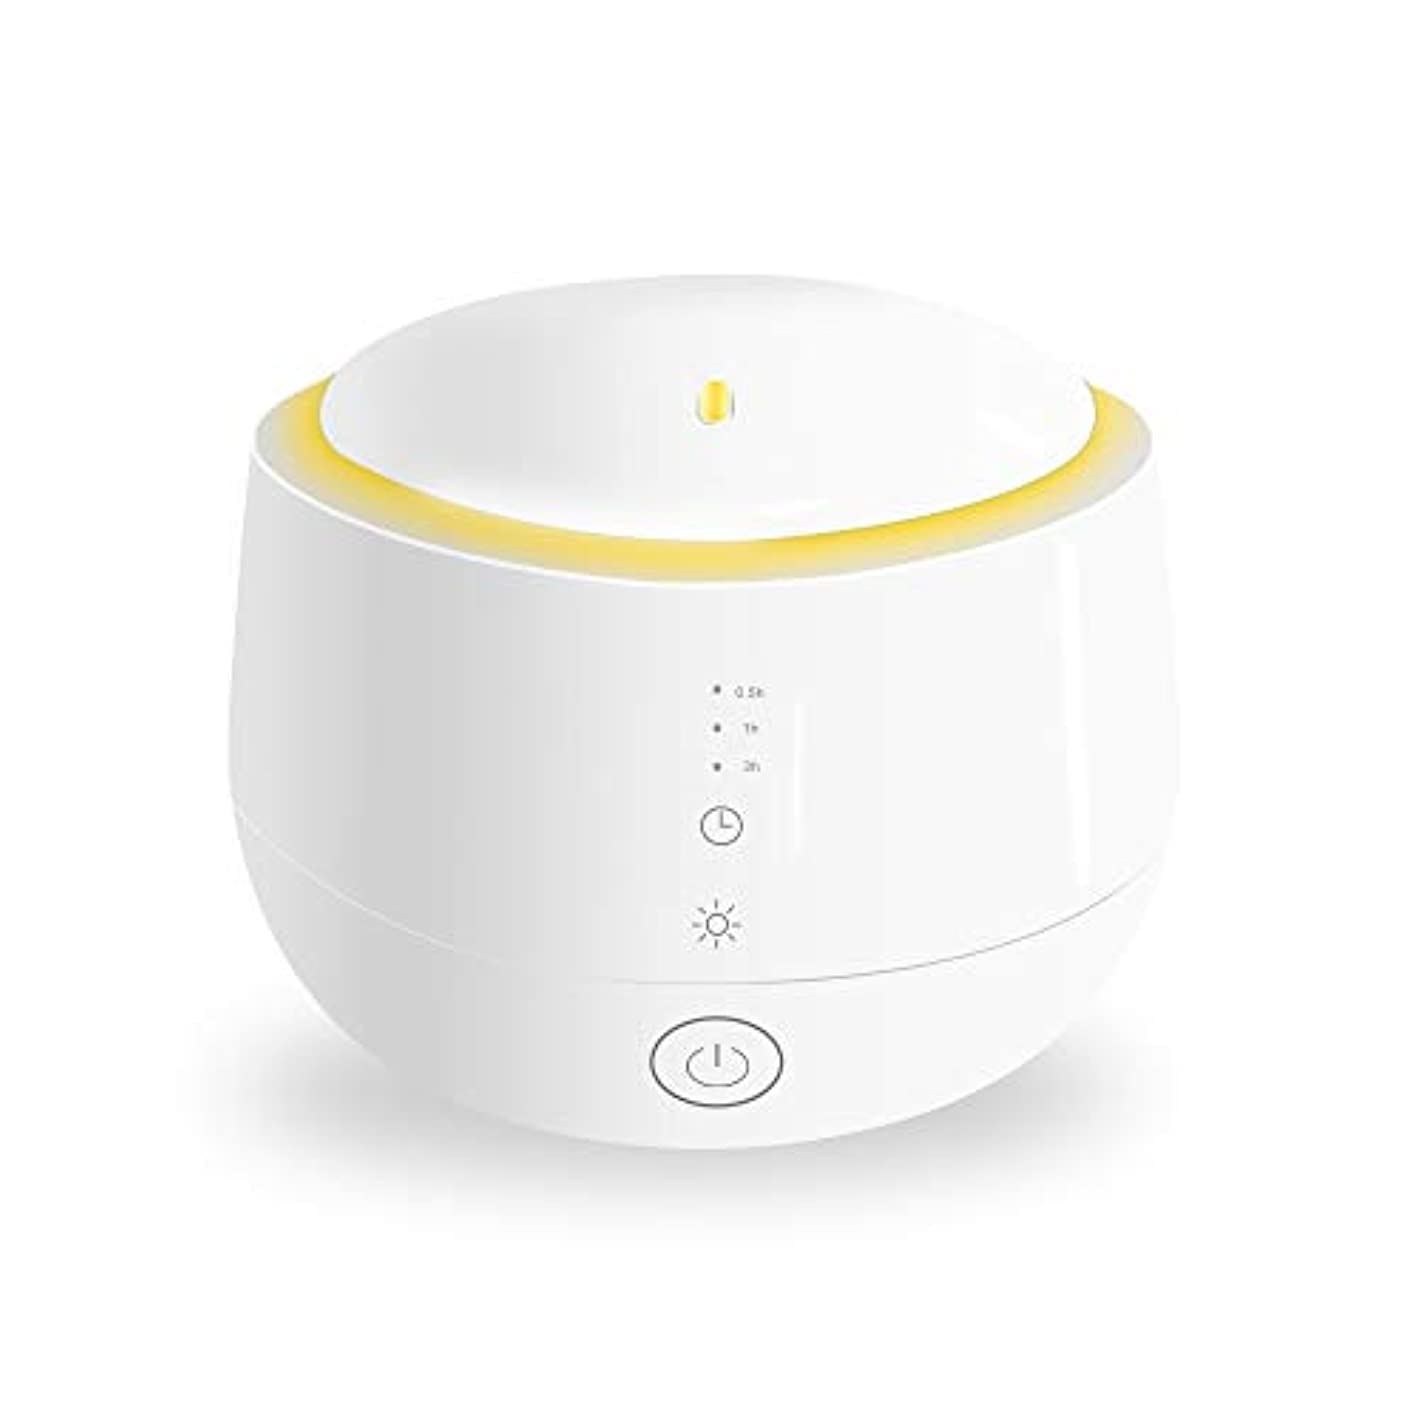 Smiler+ 超音波式 アロマディフューザー 加湿器 ムードランプ 大容量 ガラスカバー 空焚き防止機能搭載 変色LED付き 低騒音 時間設定